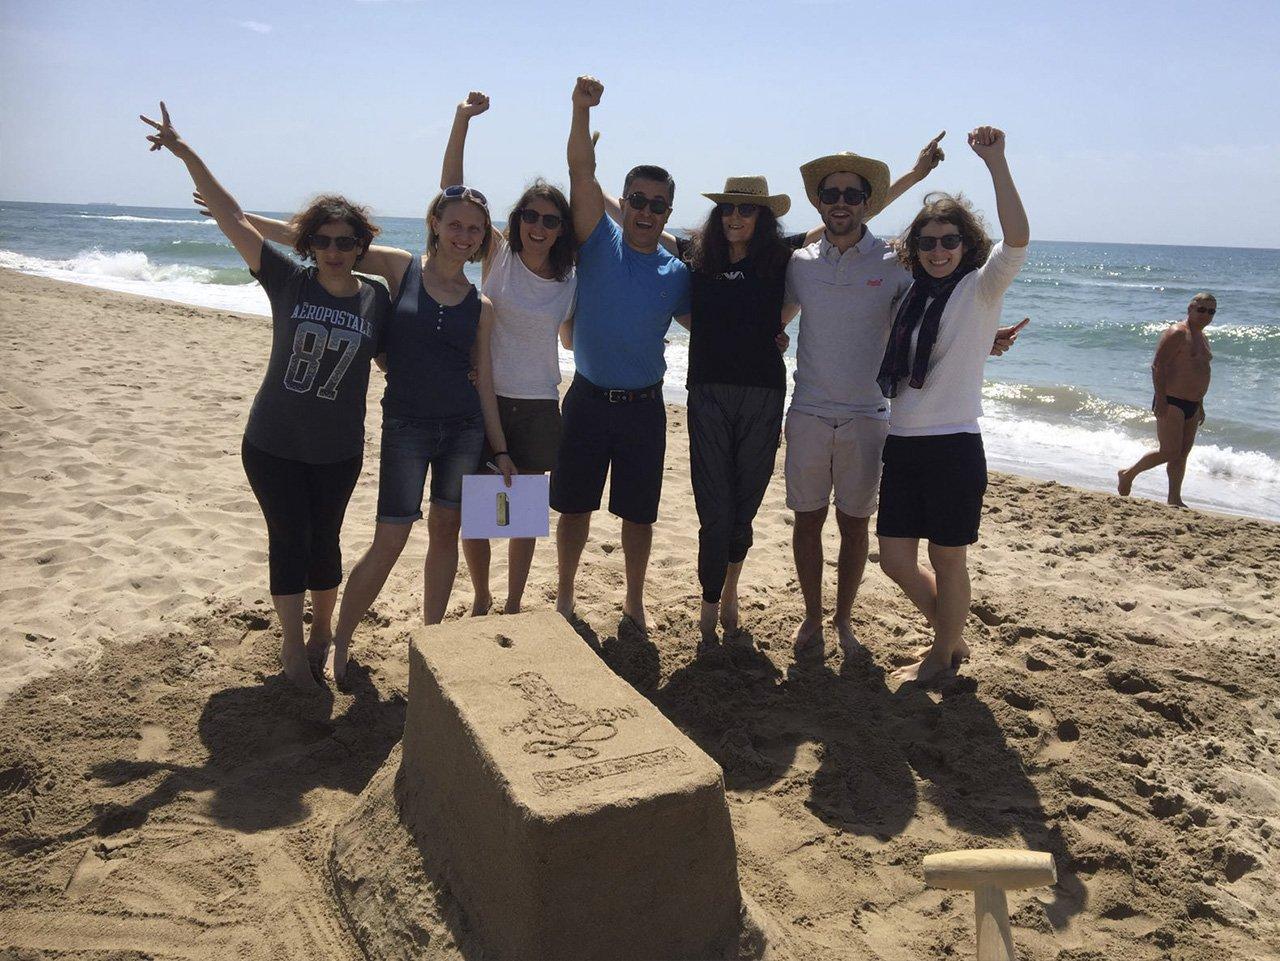 sand sculptures team building